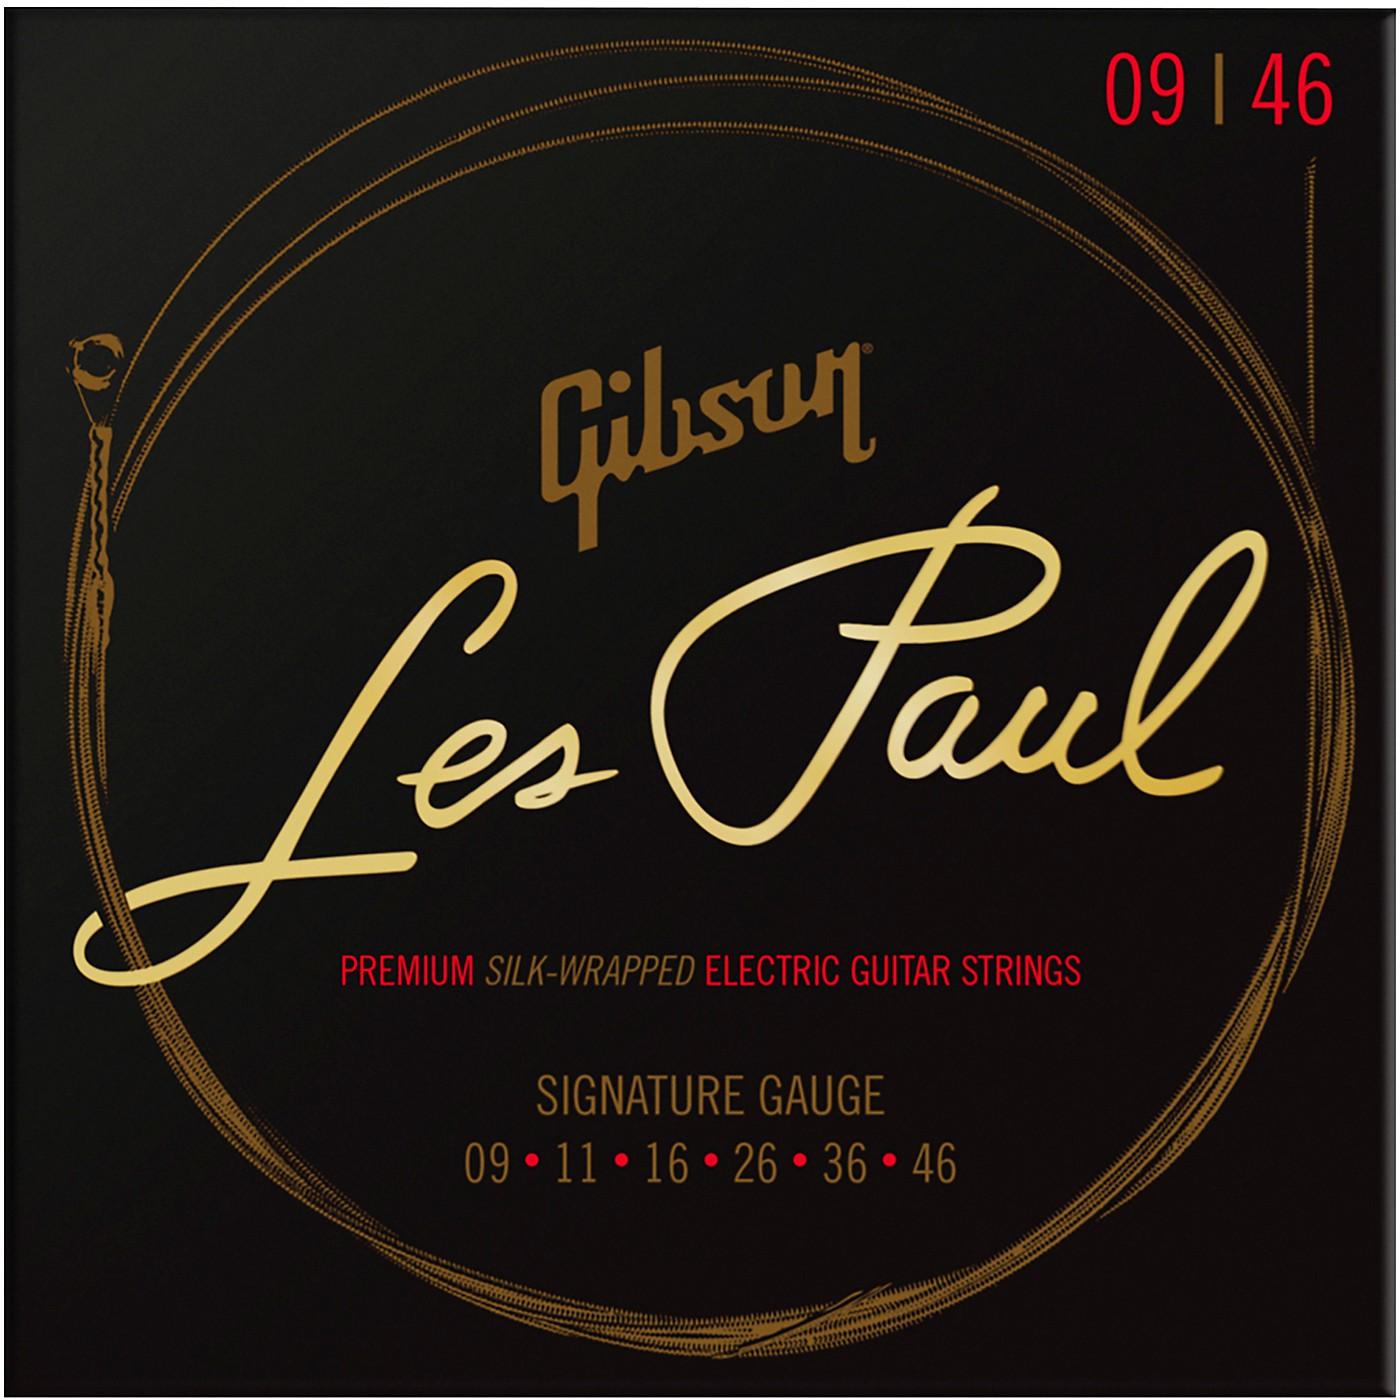 Gibson Les Paul Premium Electric Guitar Strings thumbnail